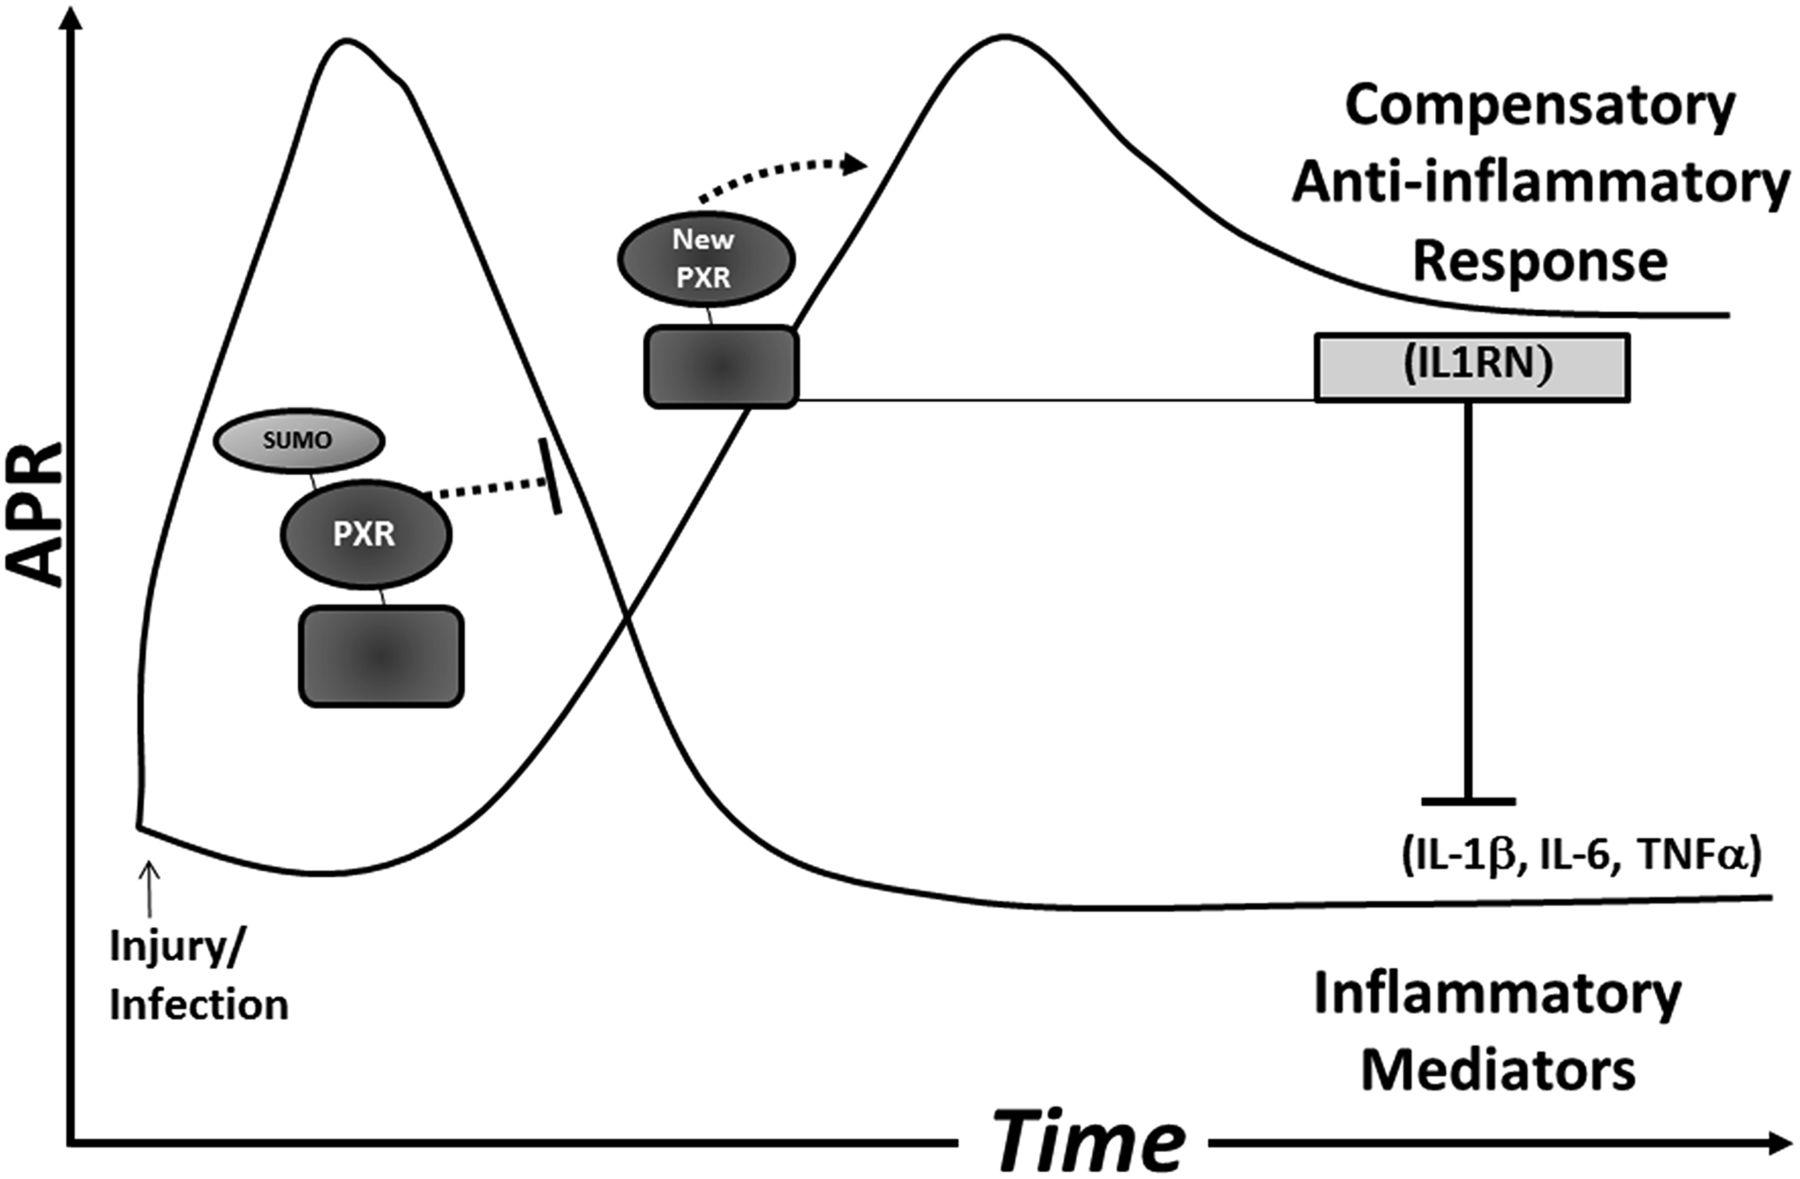 Pregnane X Receptor Modulates the Inflammatory Response in